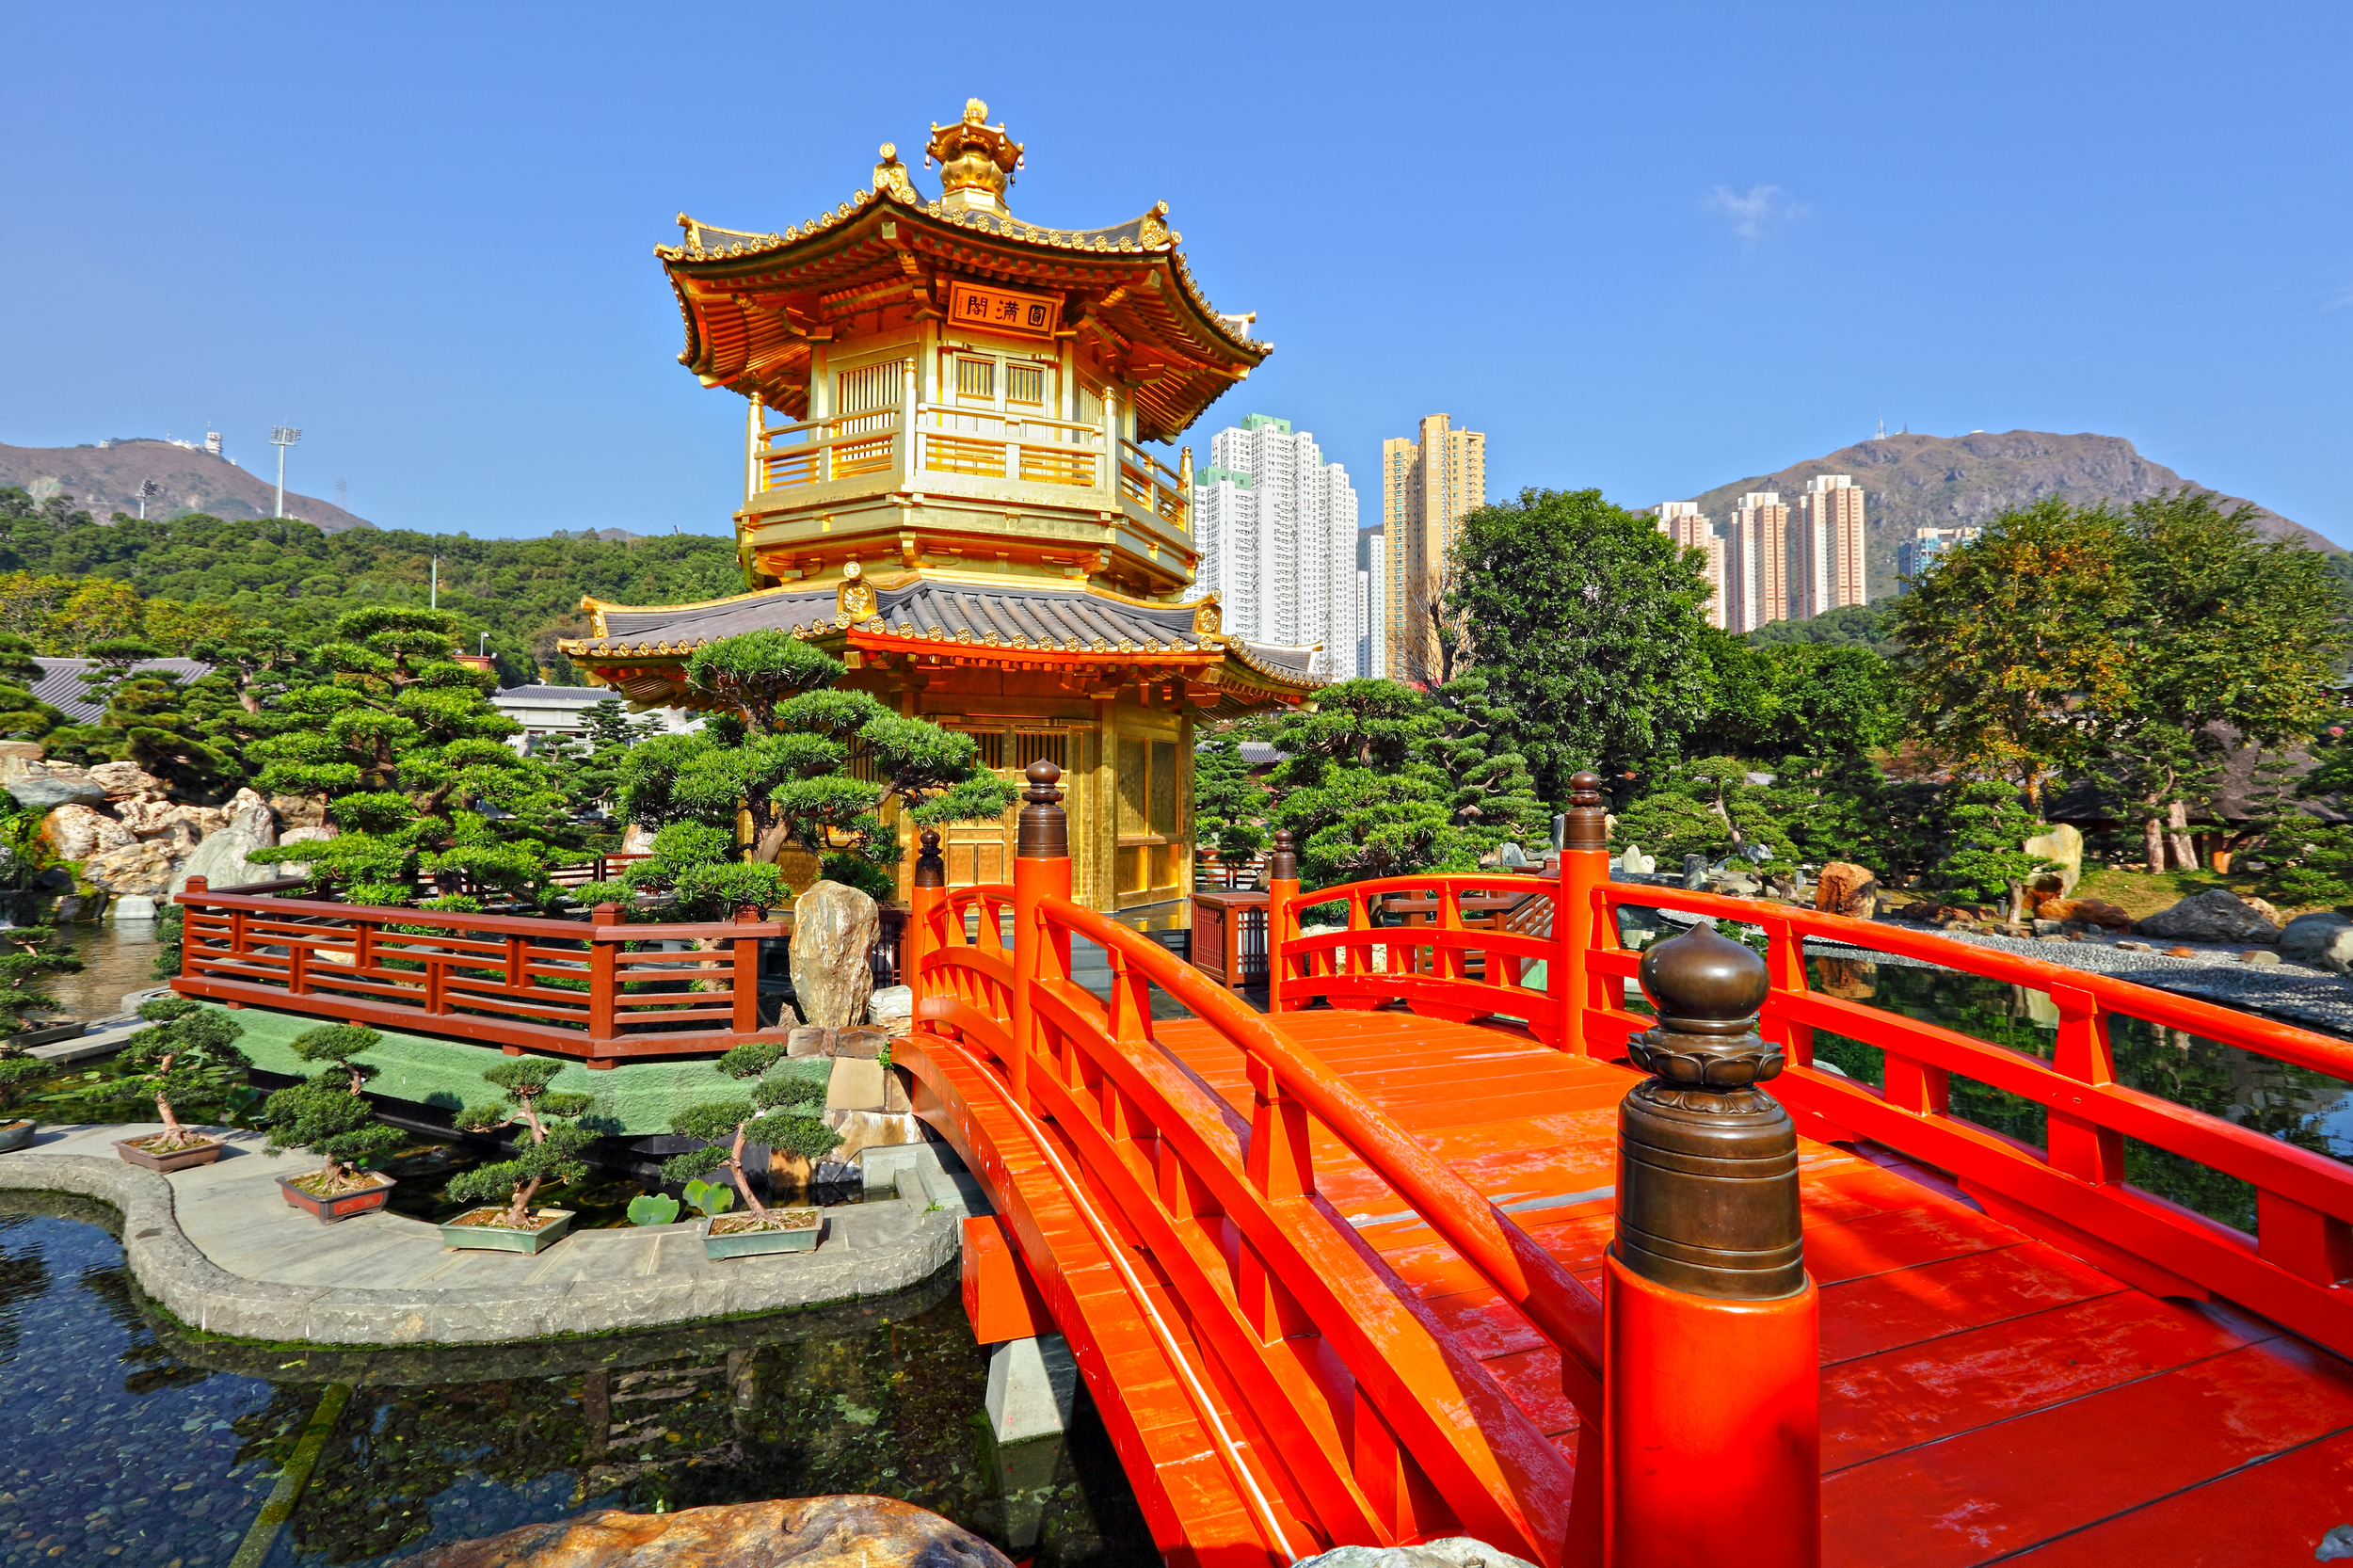 Gold Pavilion in Japanese Garden